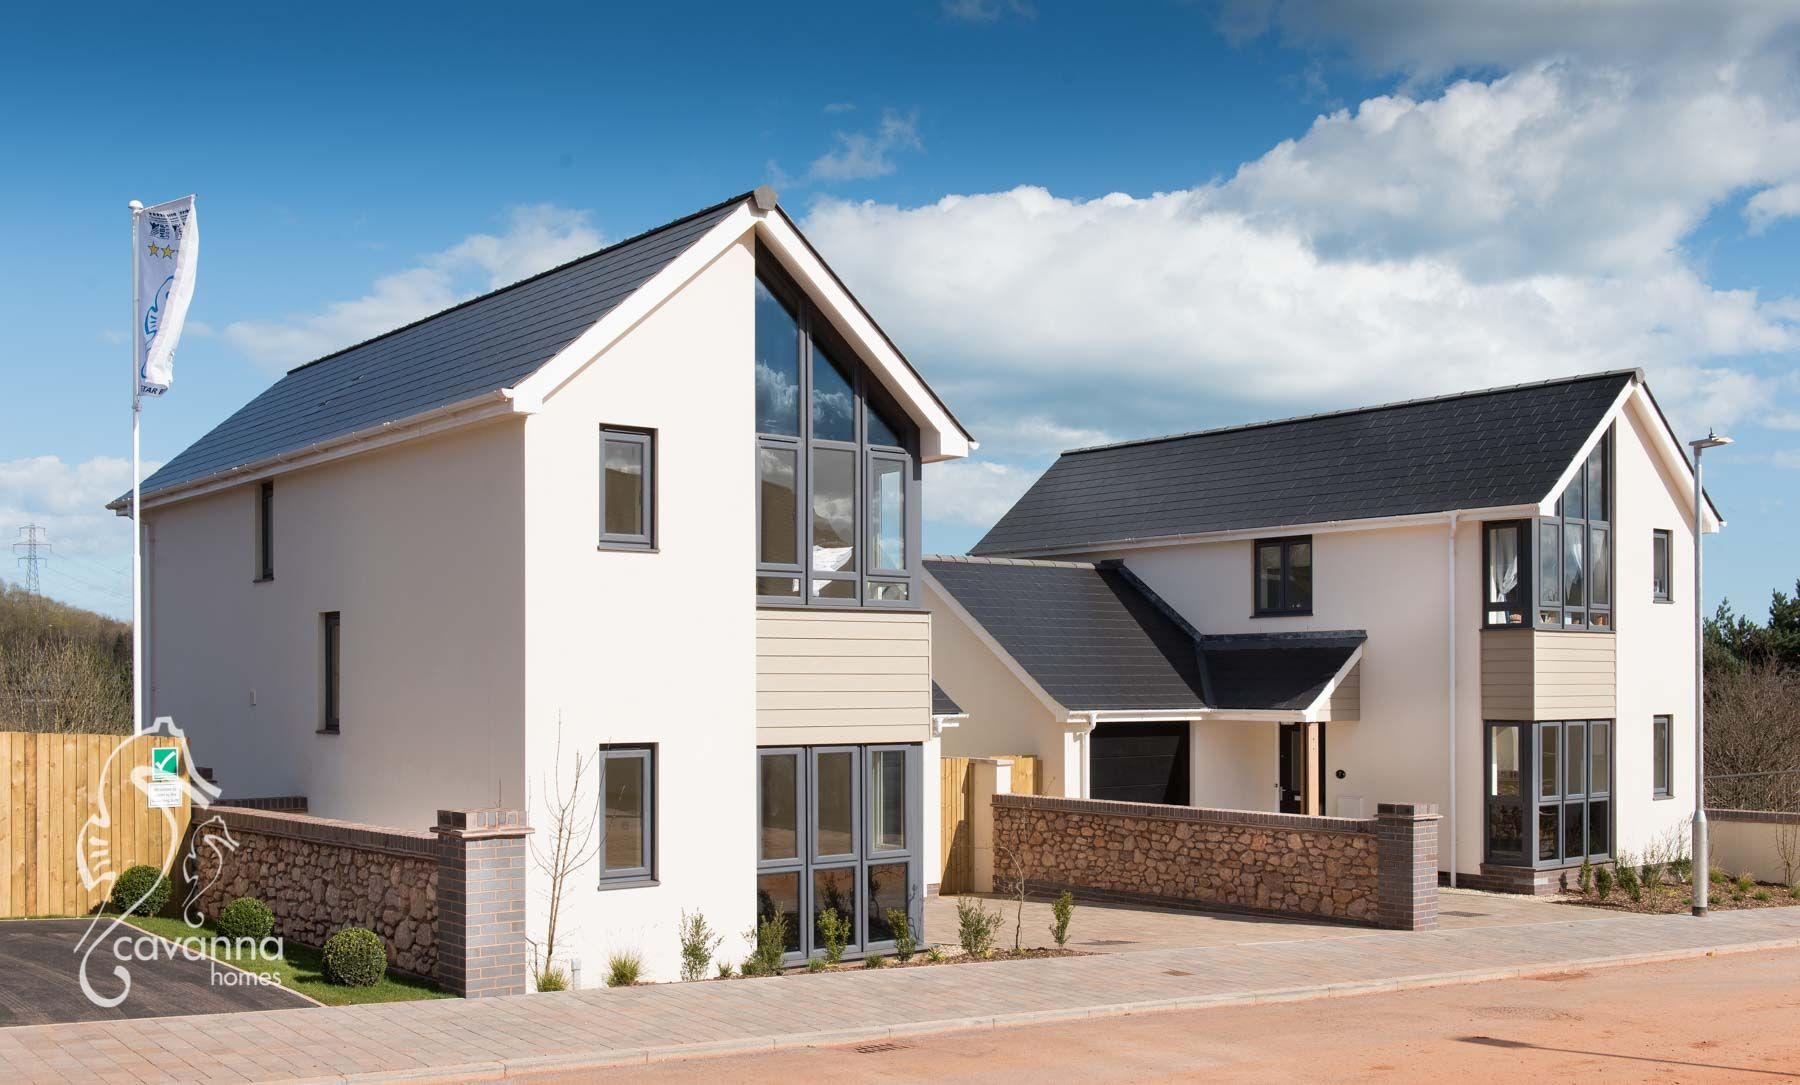 New built 3 or 4 bedroom houses for sale in Torquay, Devon ...